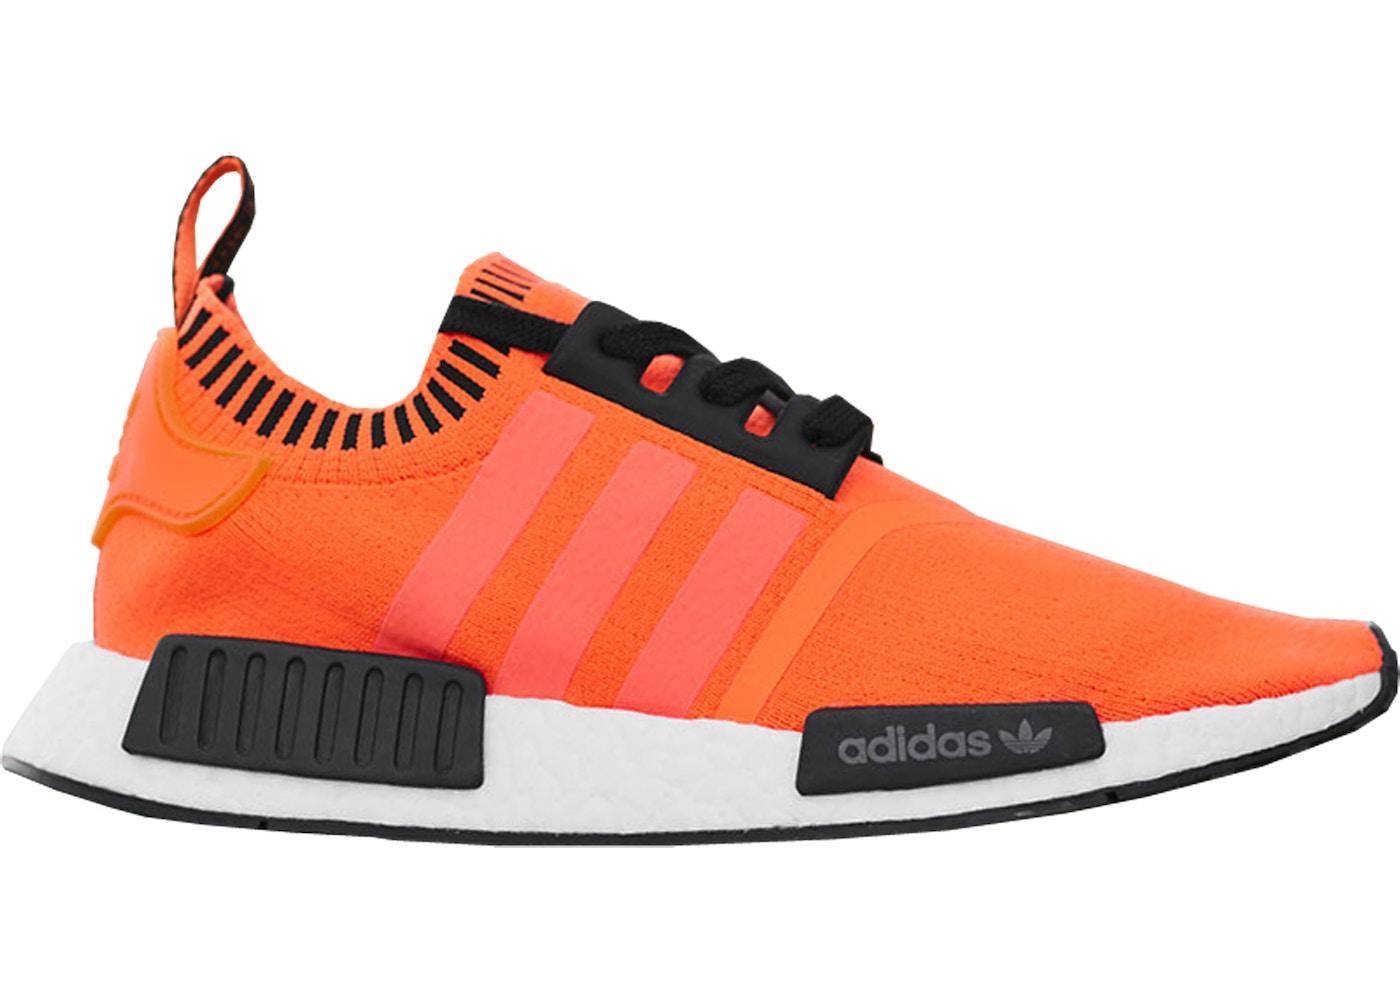 adidas nmds orange